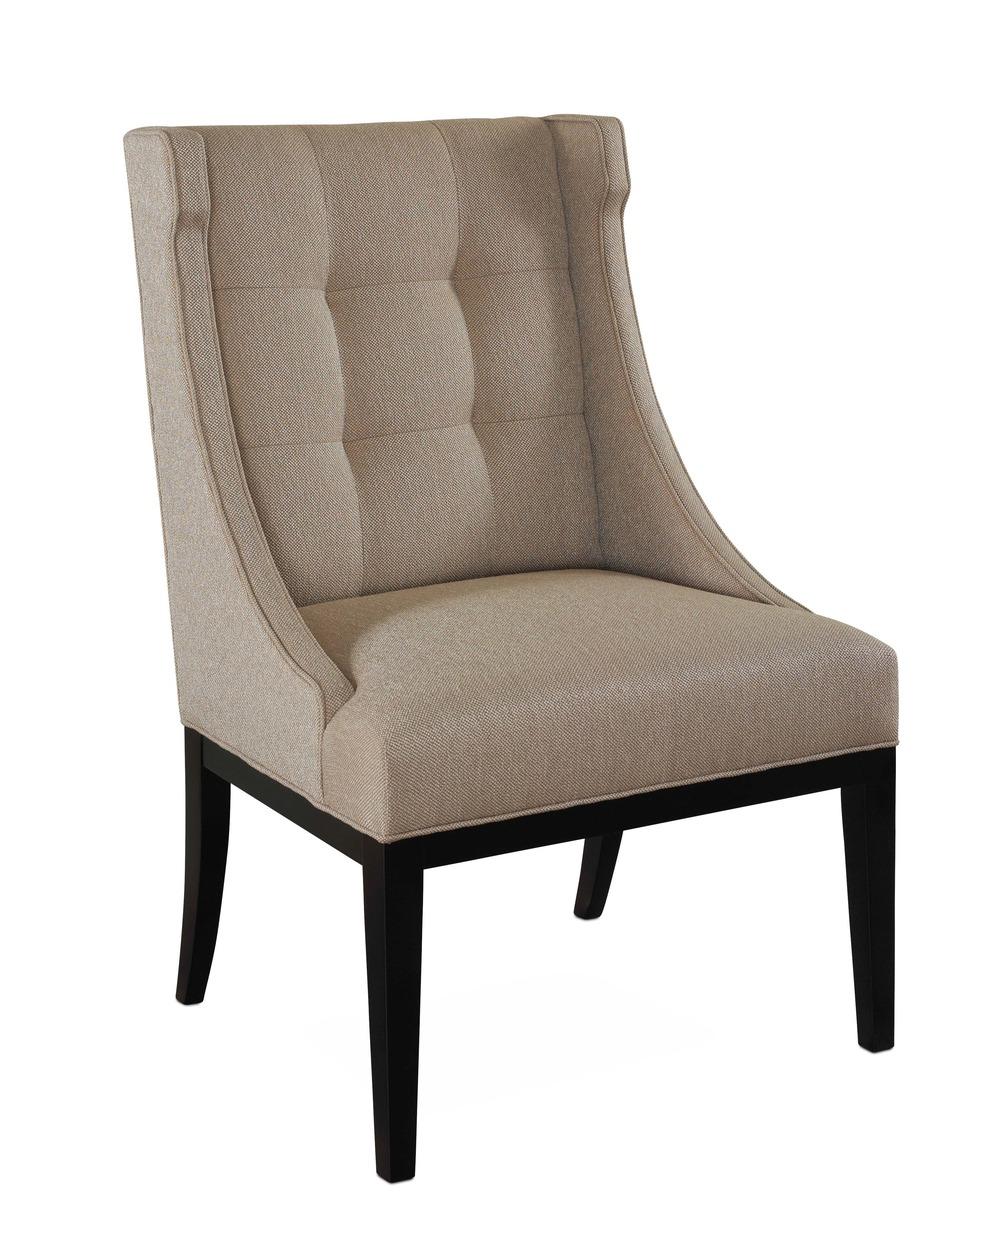 Designmaster Furniture - Franklin Side Chair